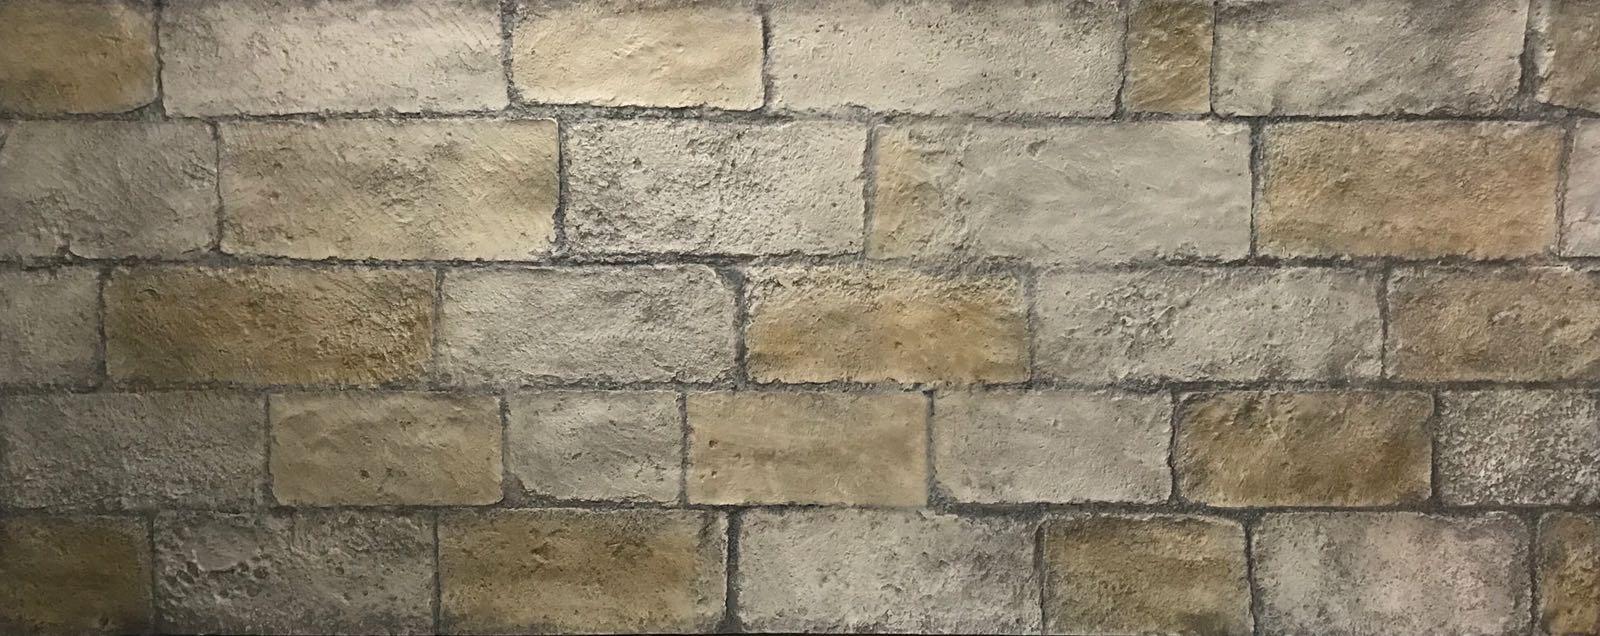 Decrepito - Venon Duvar Panelleri, Fiber Panel